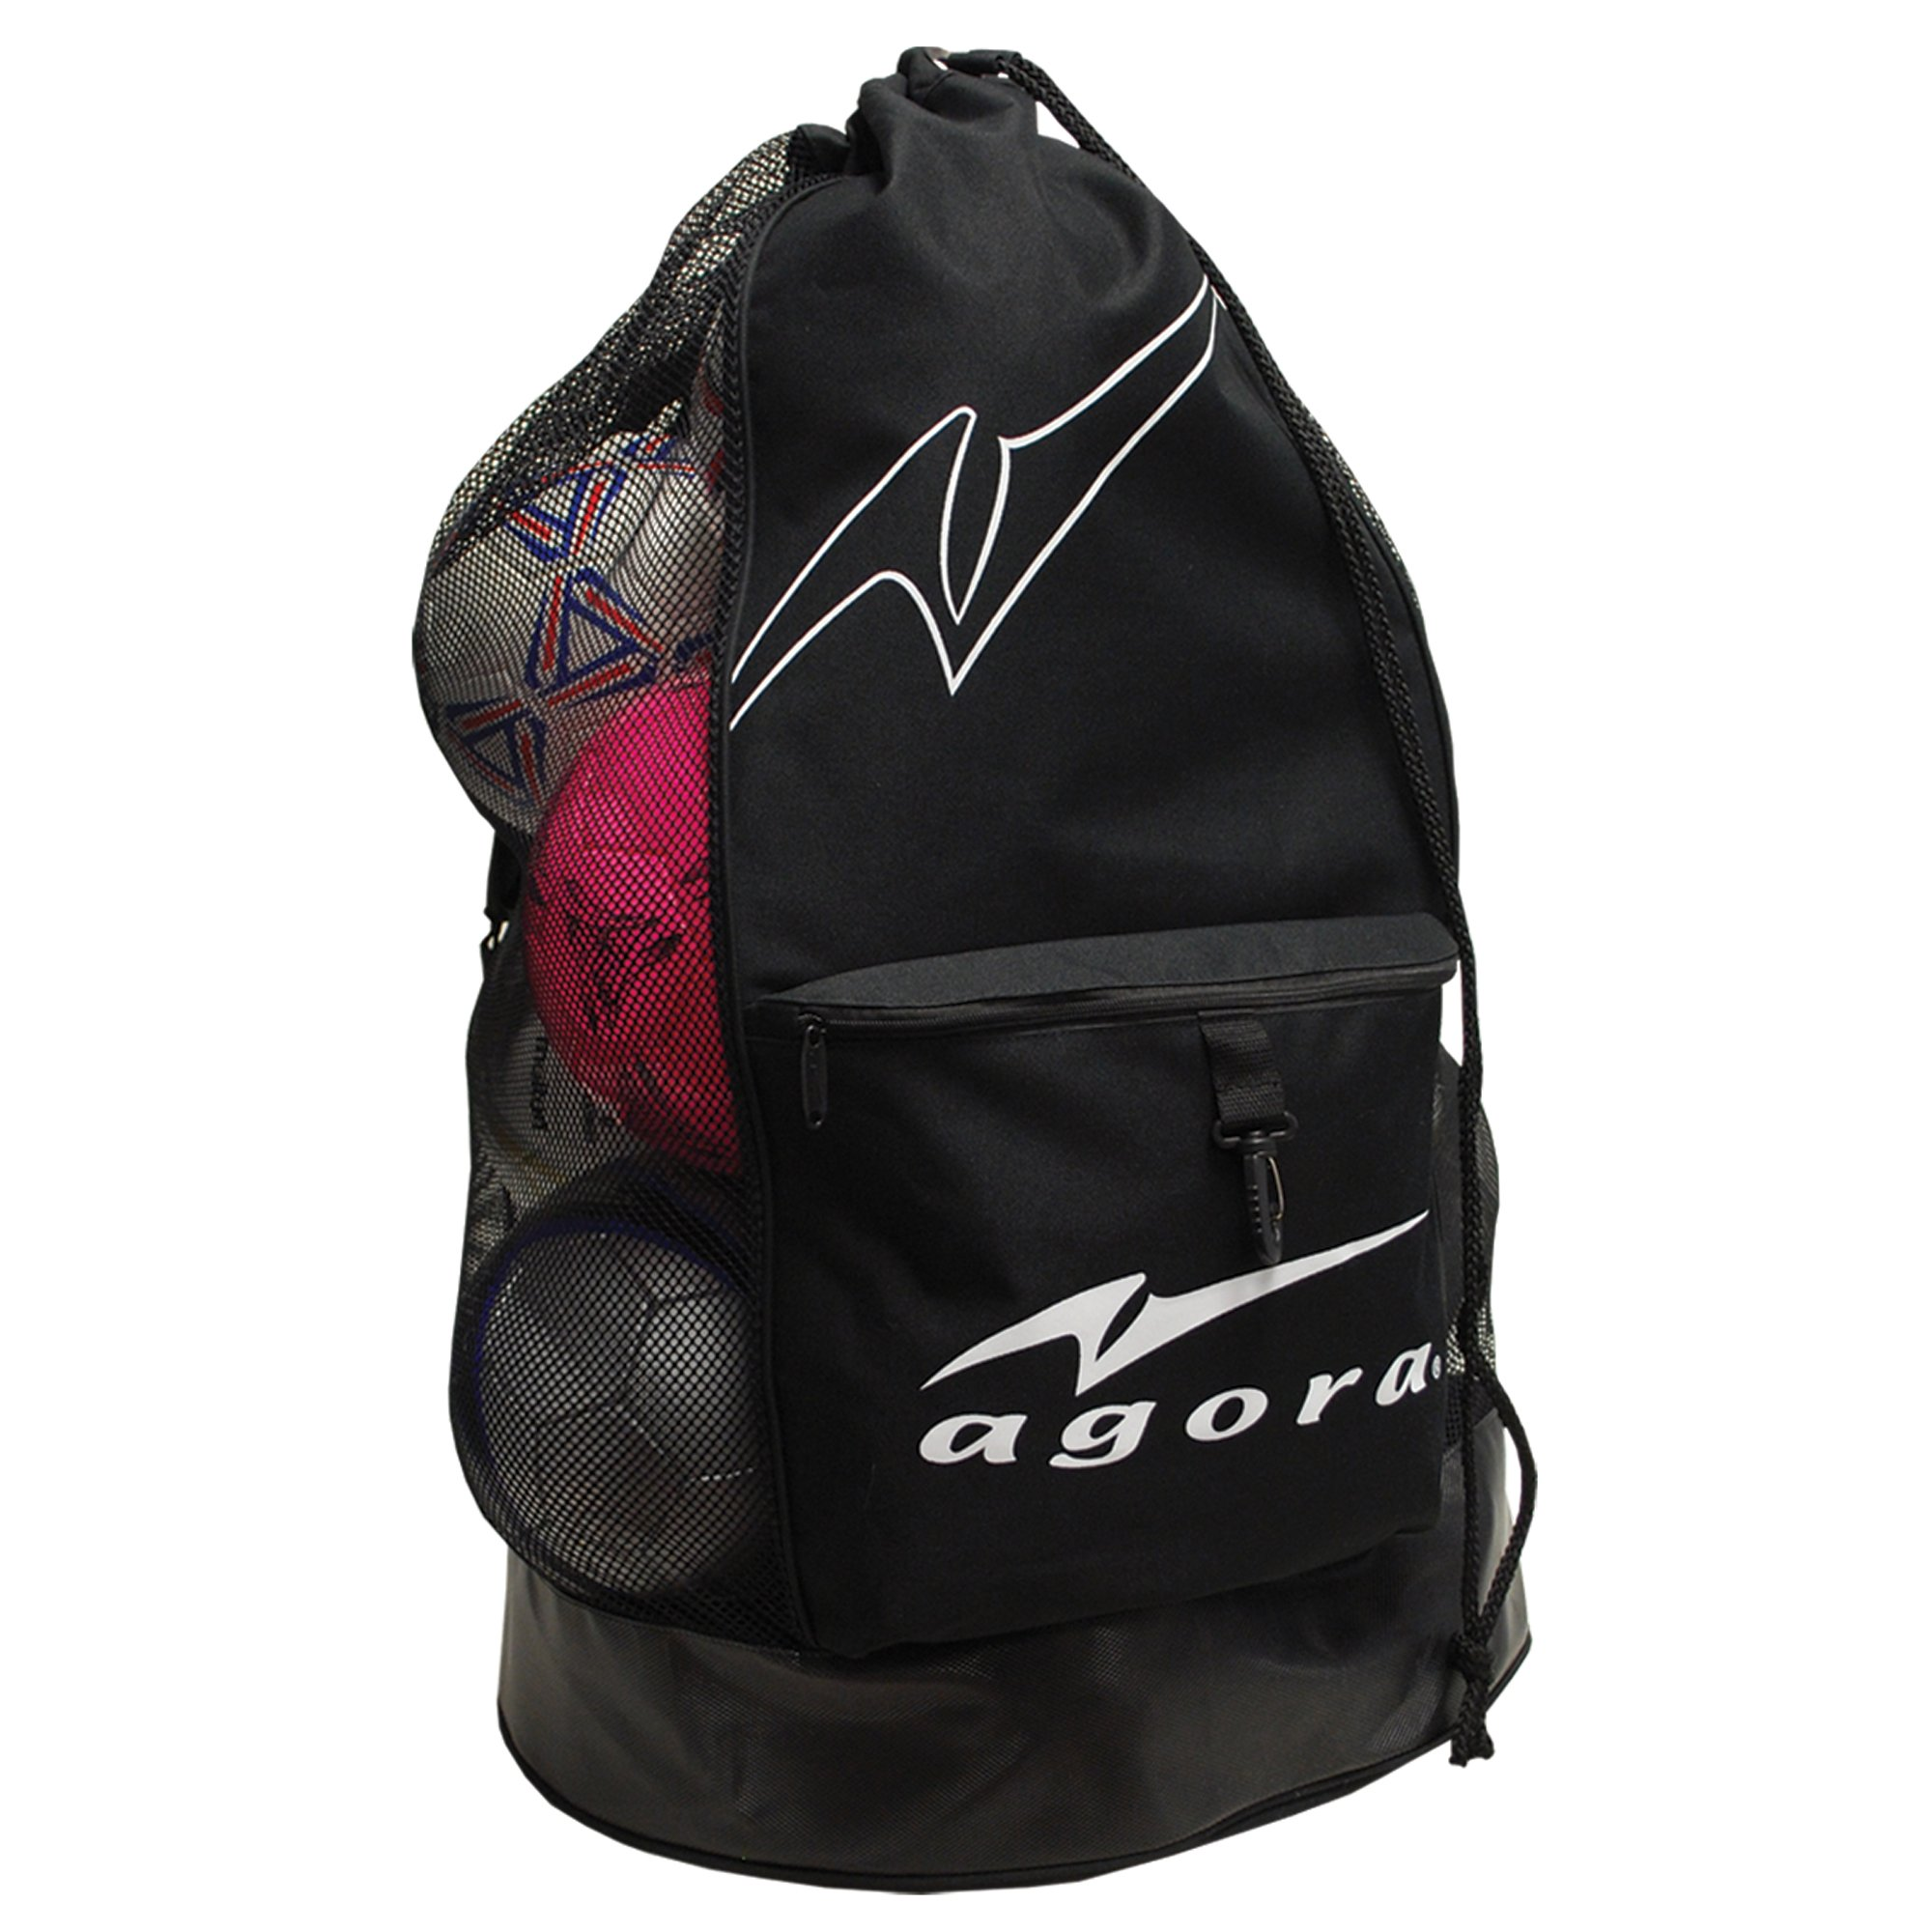 AGORA Heavy-Duty Soccer Ball Carrier Bag (12-15 Balls), Black by AGORA (Image #1)